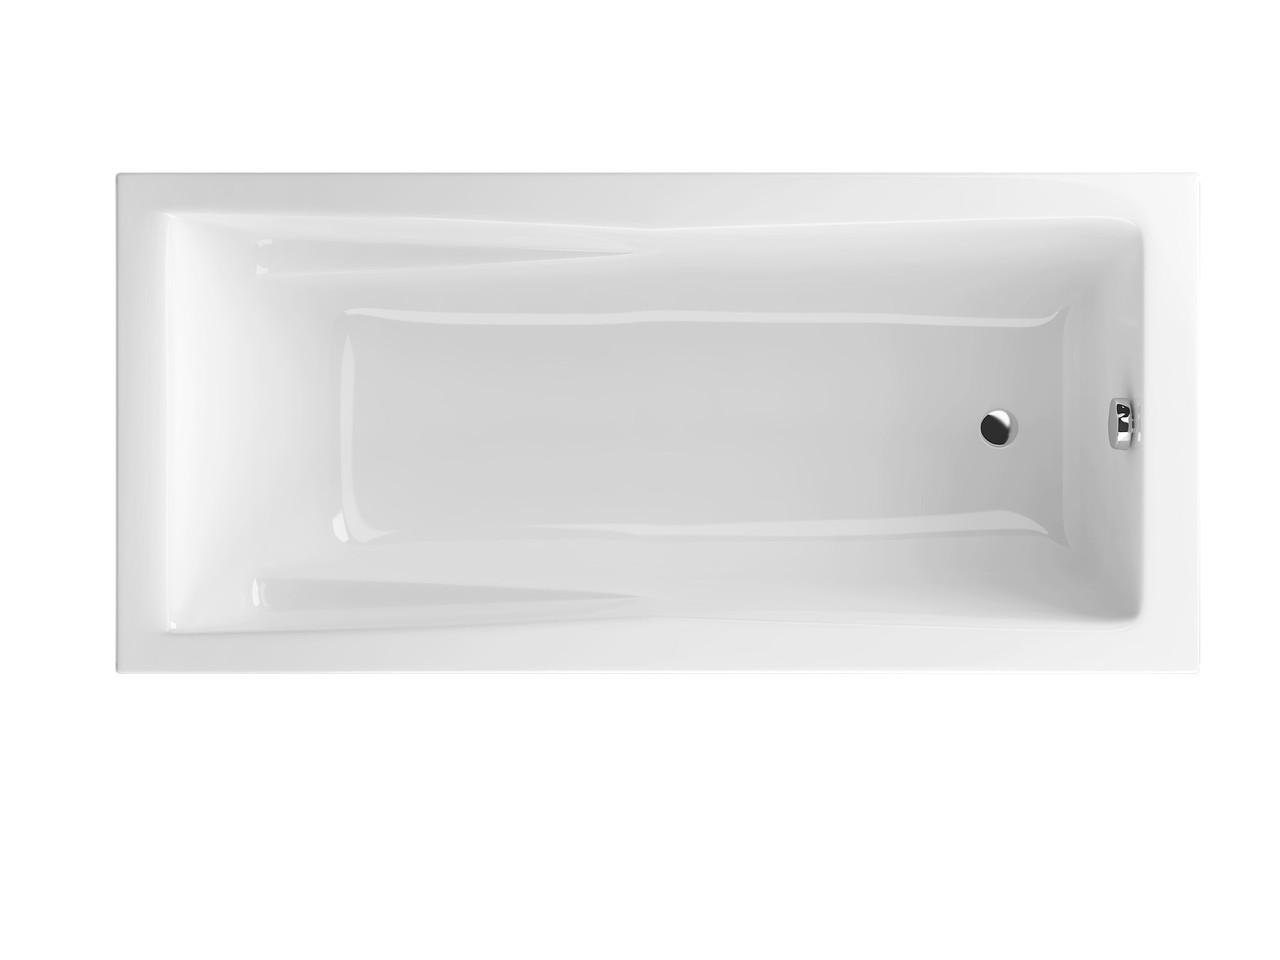 Ванна Excellent Palace 1600x750 мм (WAEX.PAL16WH)